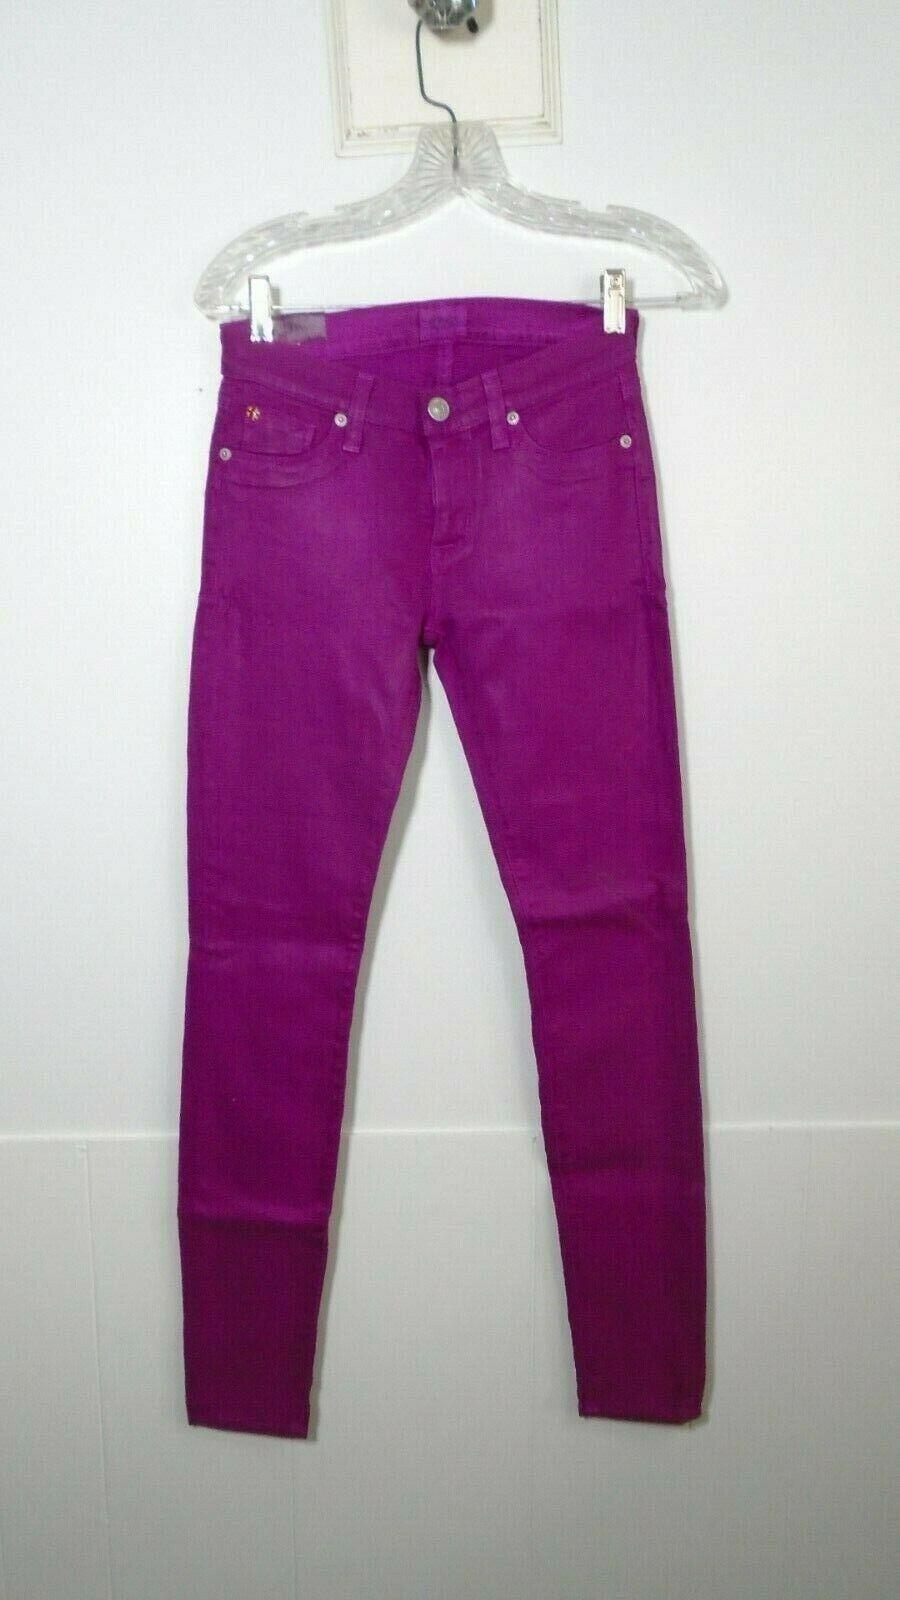 Hudson Woman 's Jeans Krista Super Skinny  NWT  Size 26